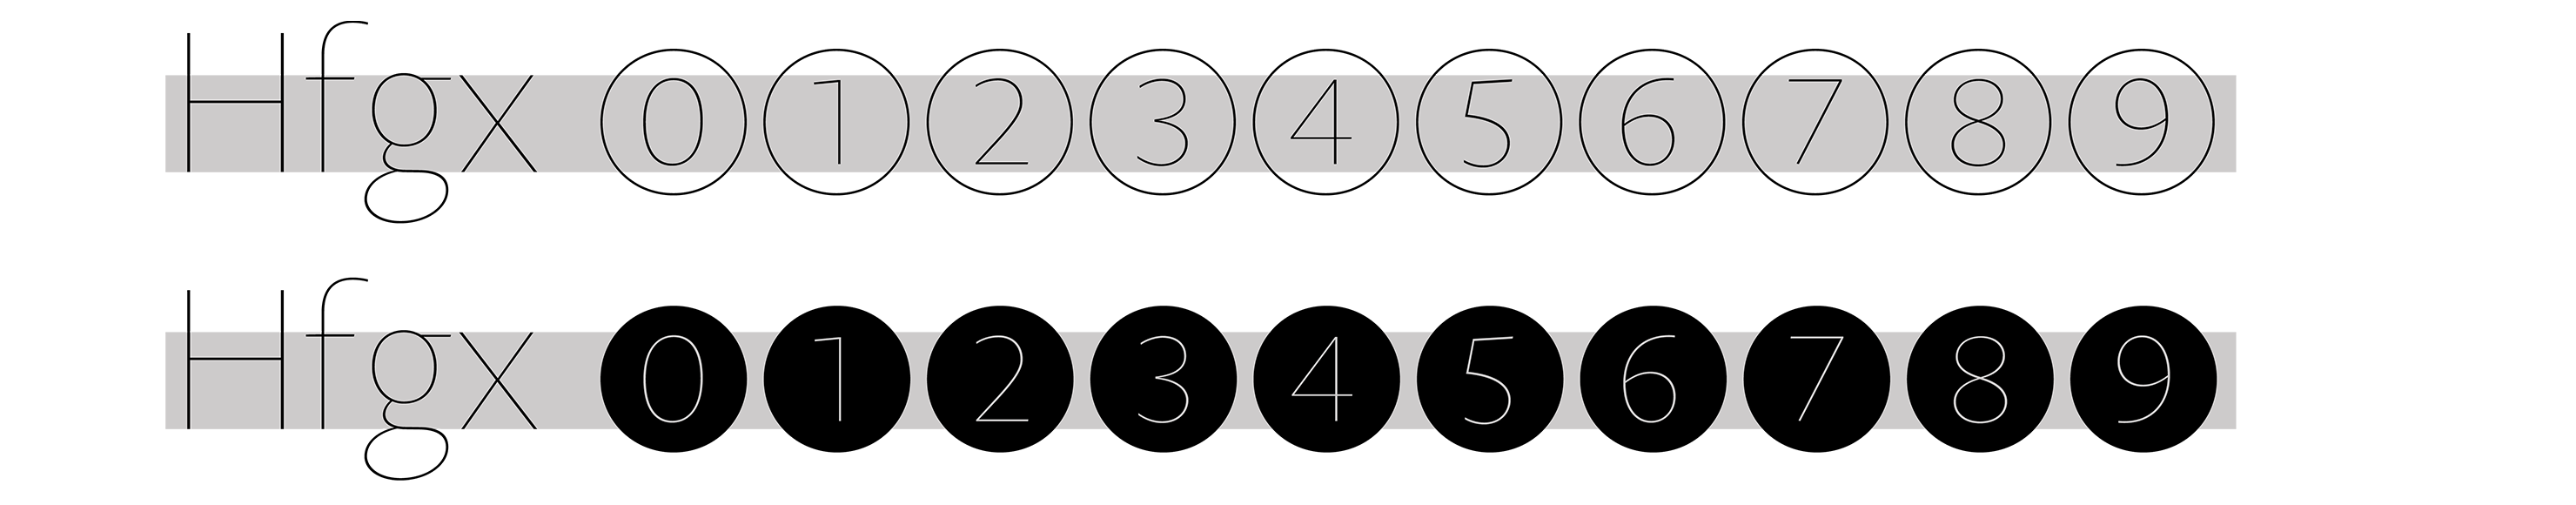 Typeface-Novel-Sans-Hairline-F21-Atlas-Font-Foundry